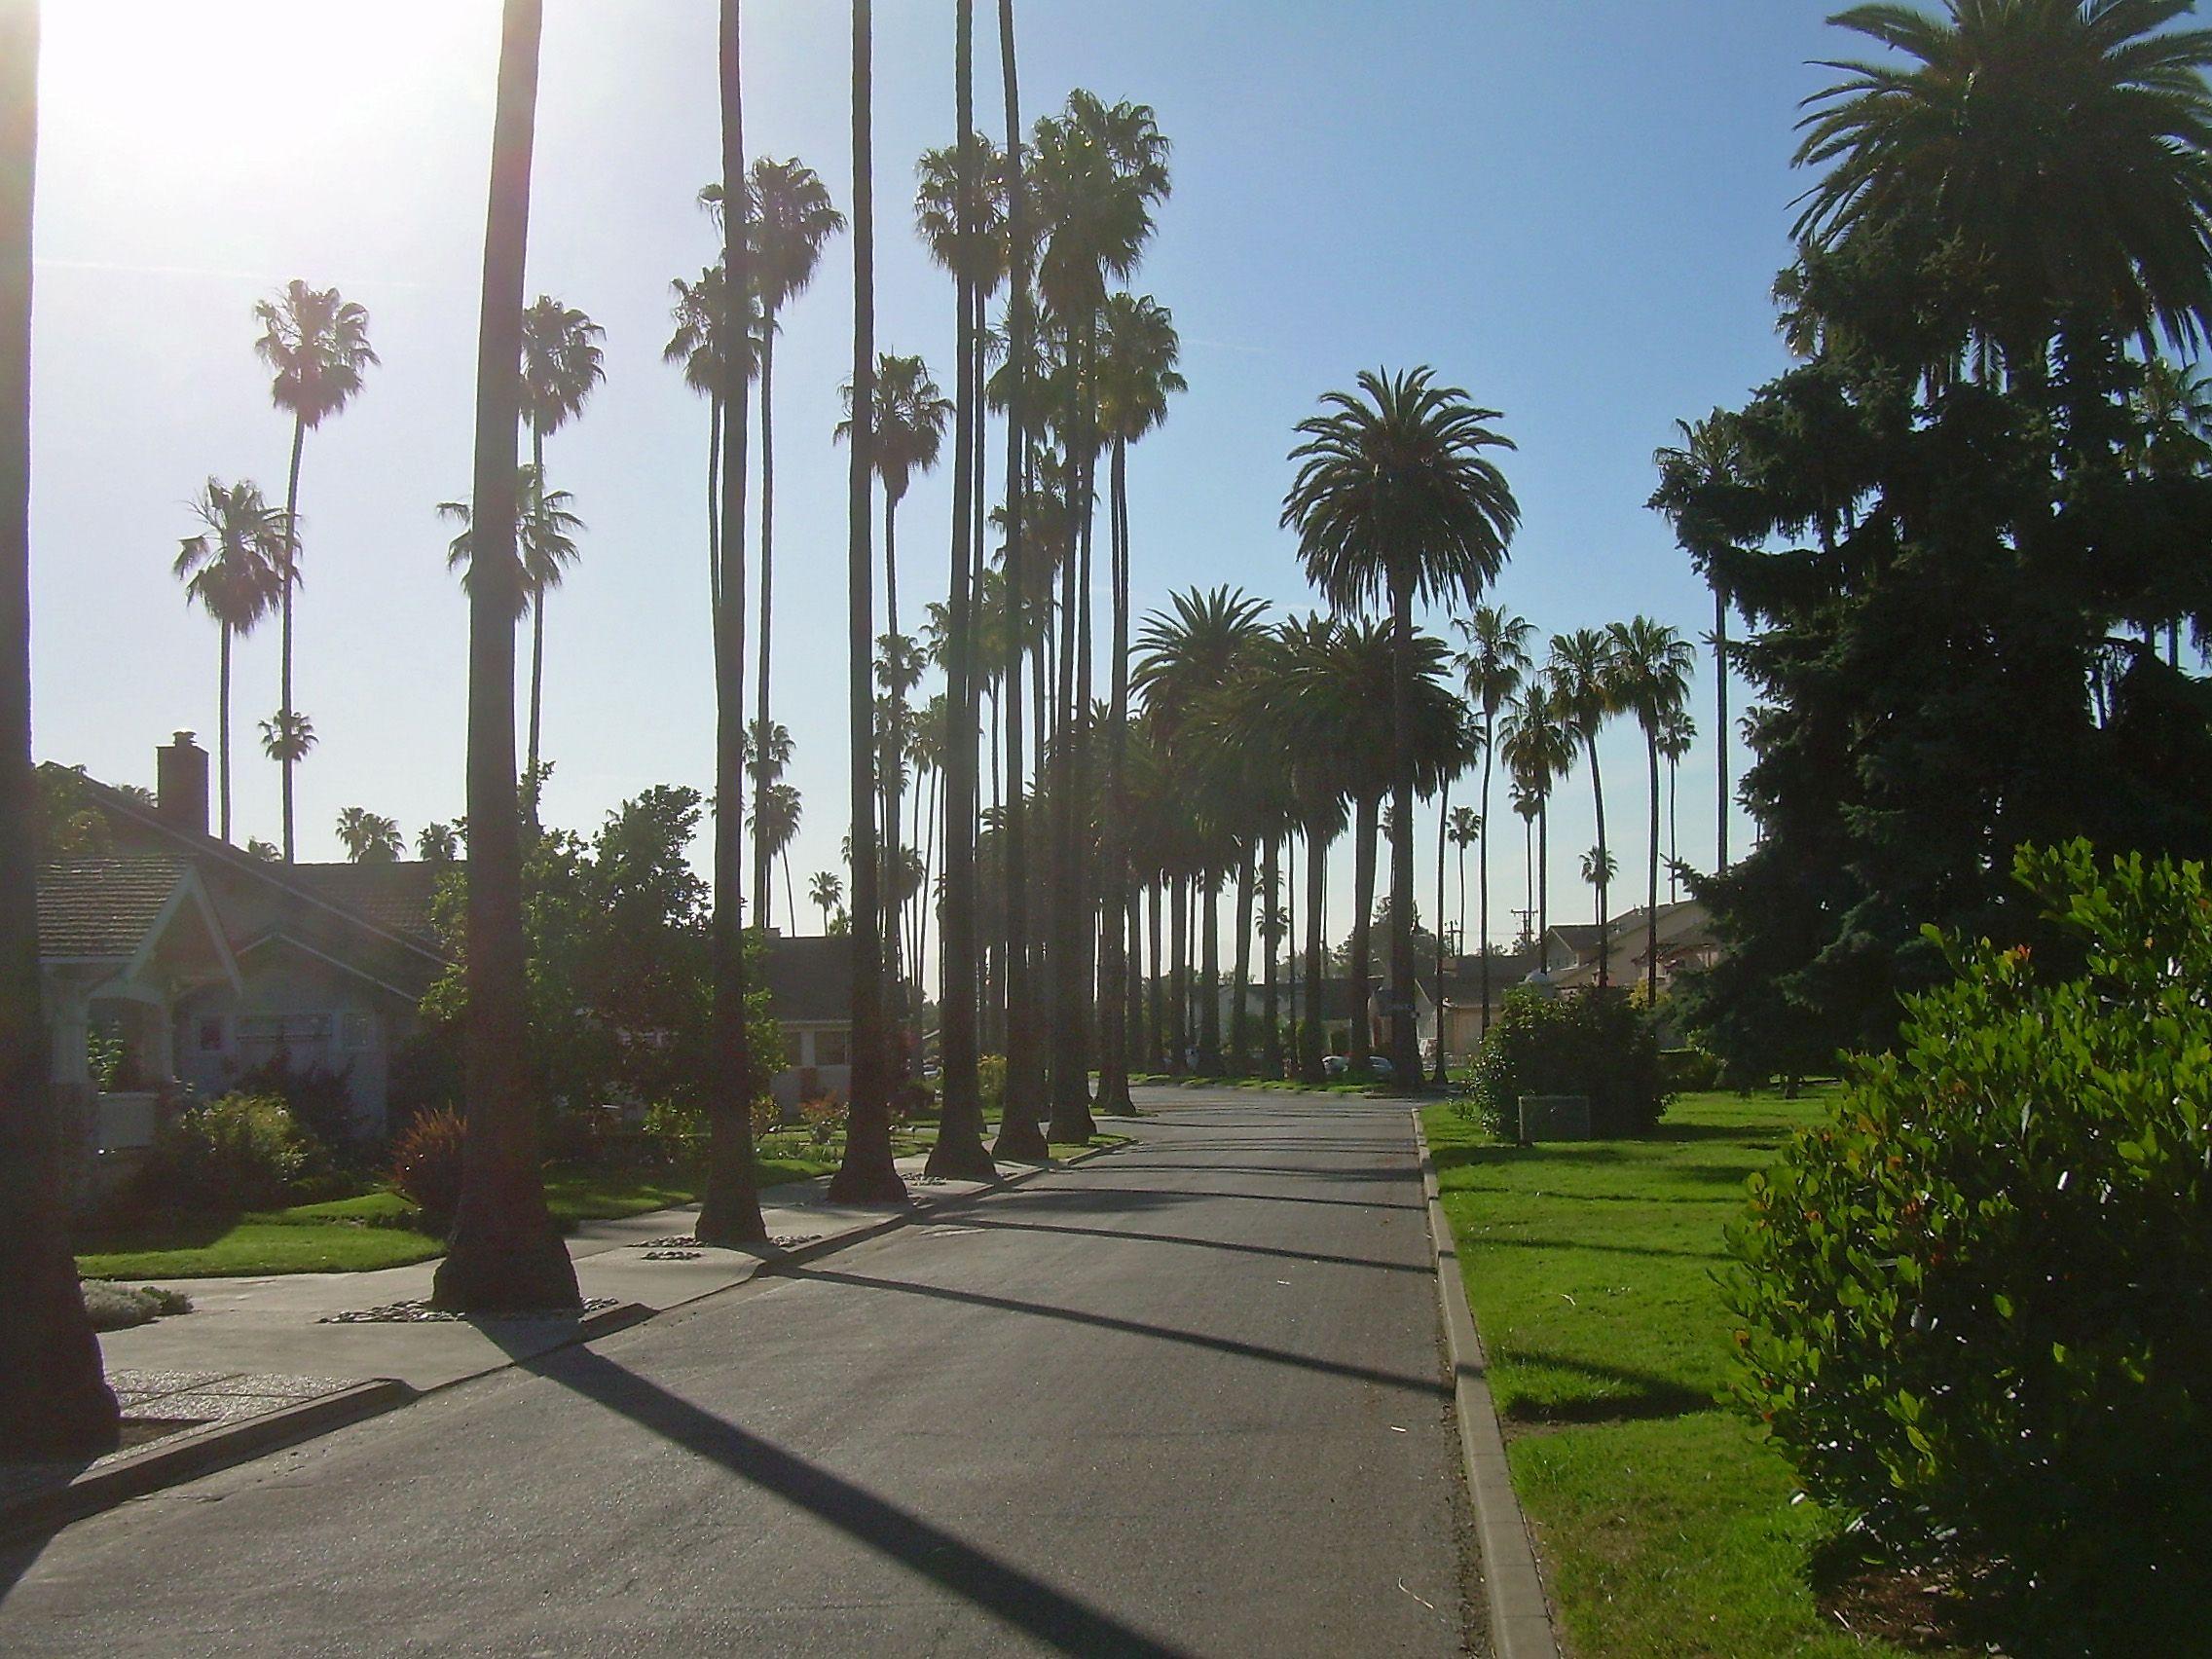 San Jose Monterey Map%0A California Palm Trees   Description Palm Trees in San Jose California jpg   Okay everybody